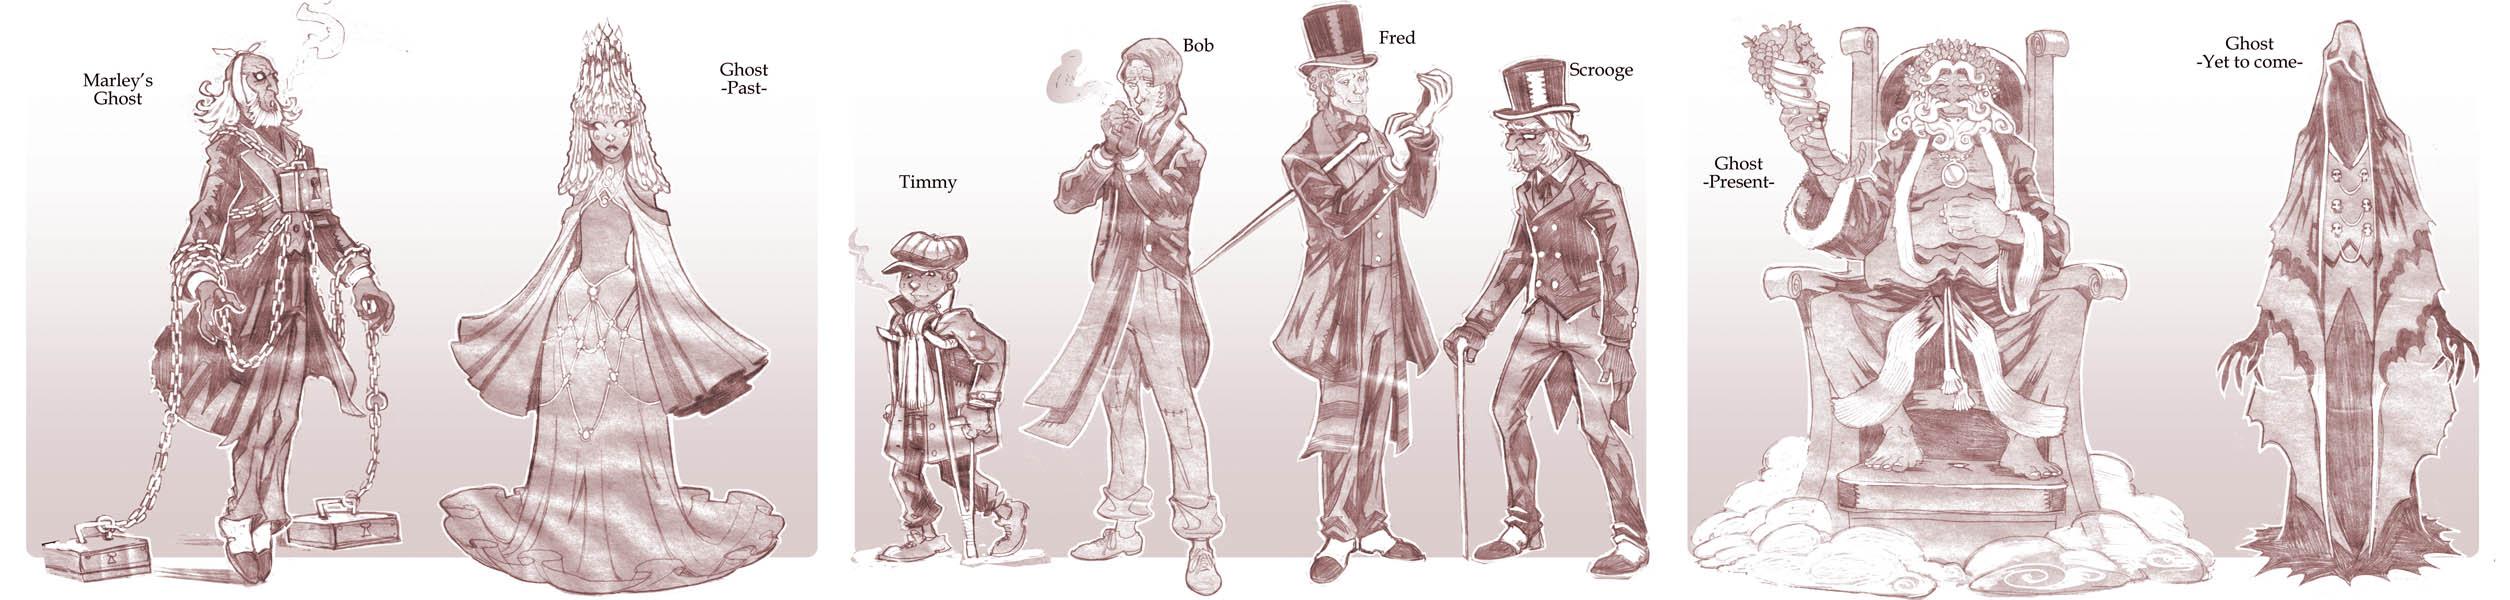 Christmas Carol character concepts by Nezart on DeviantArt